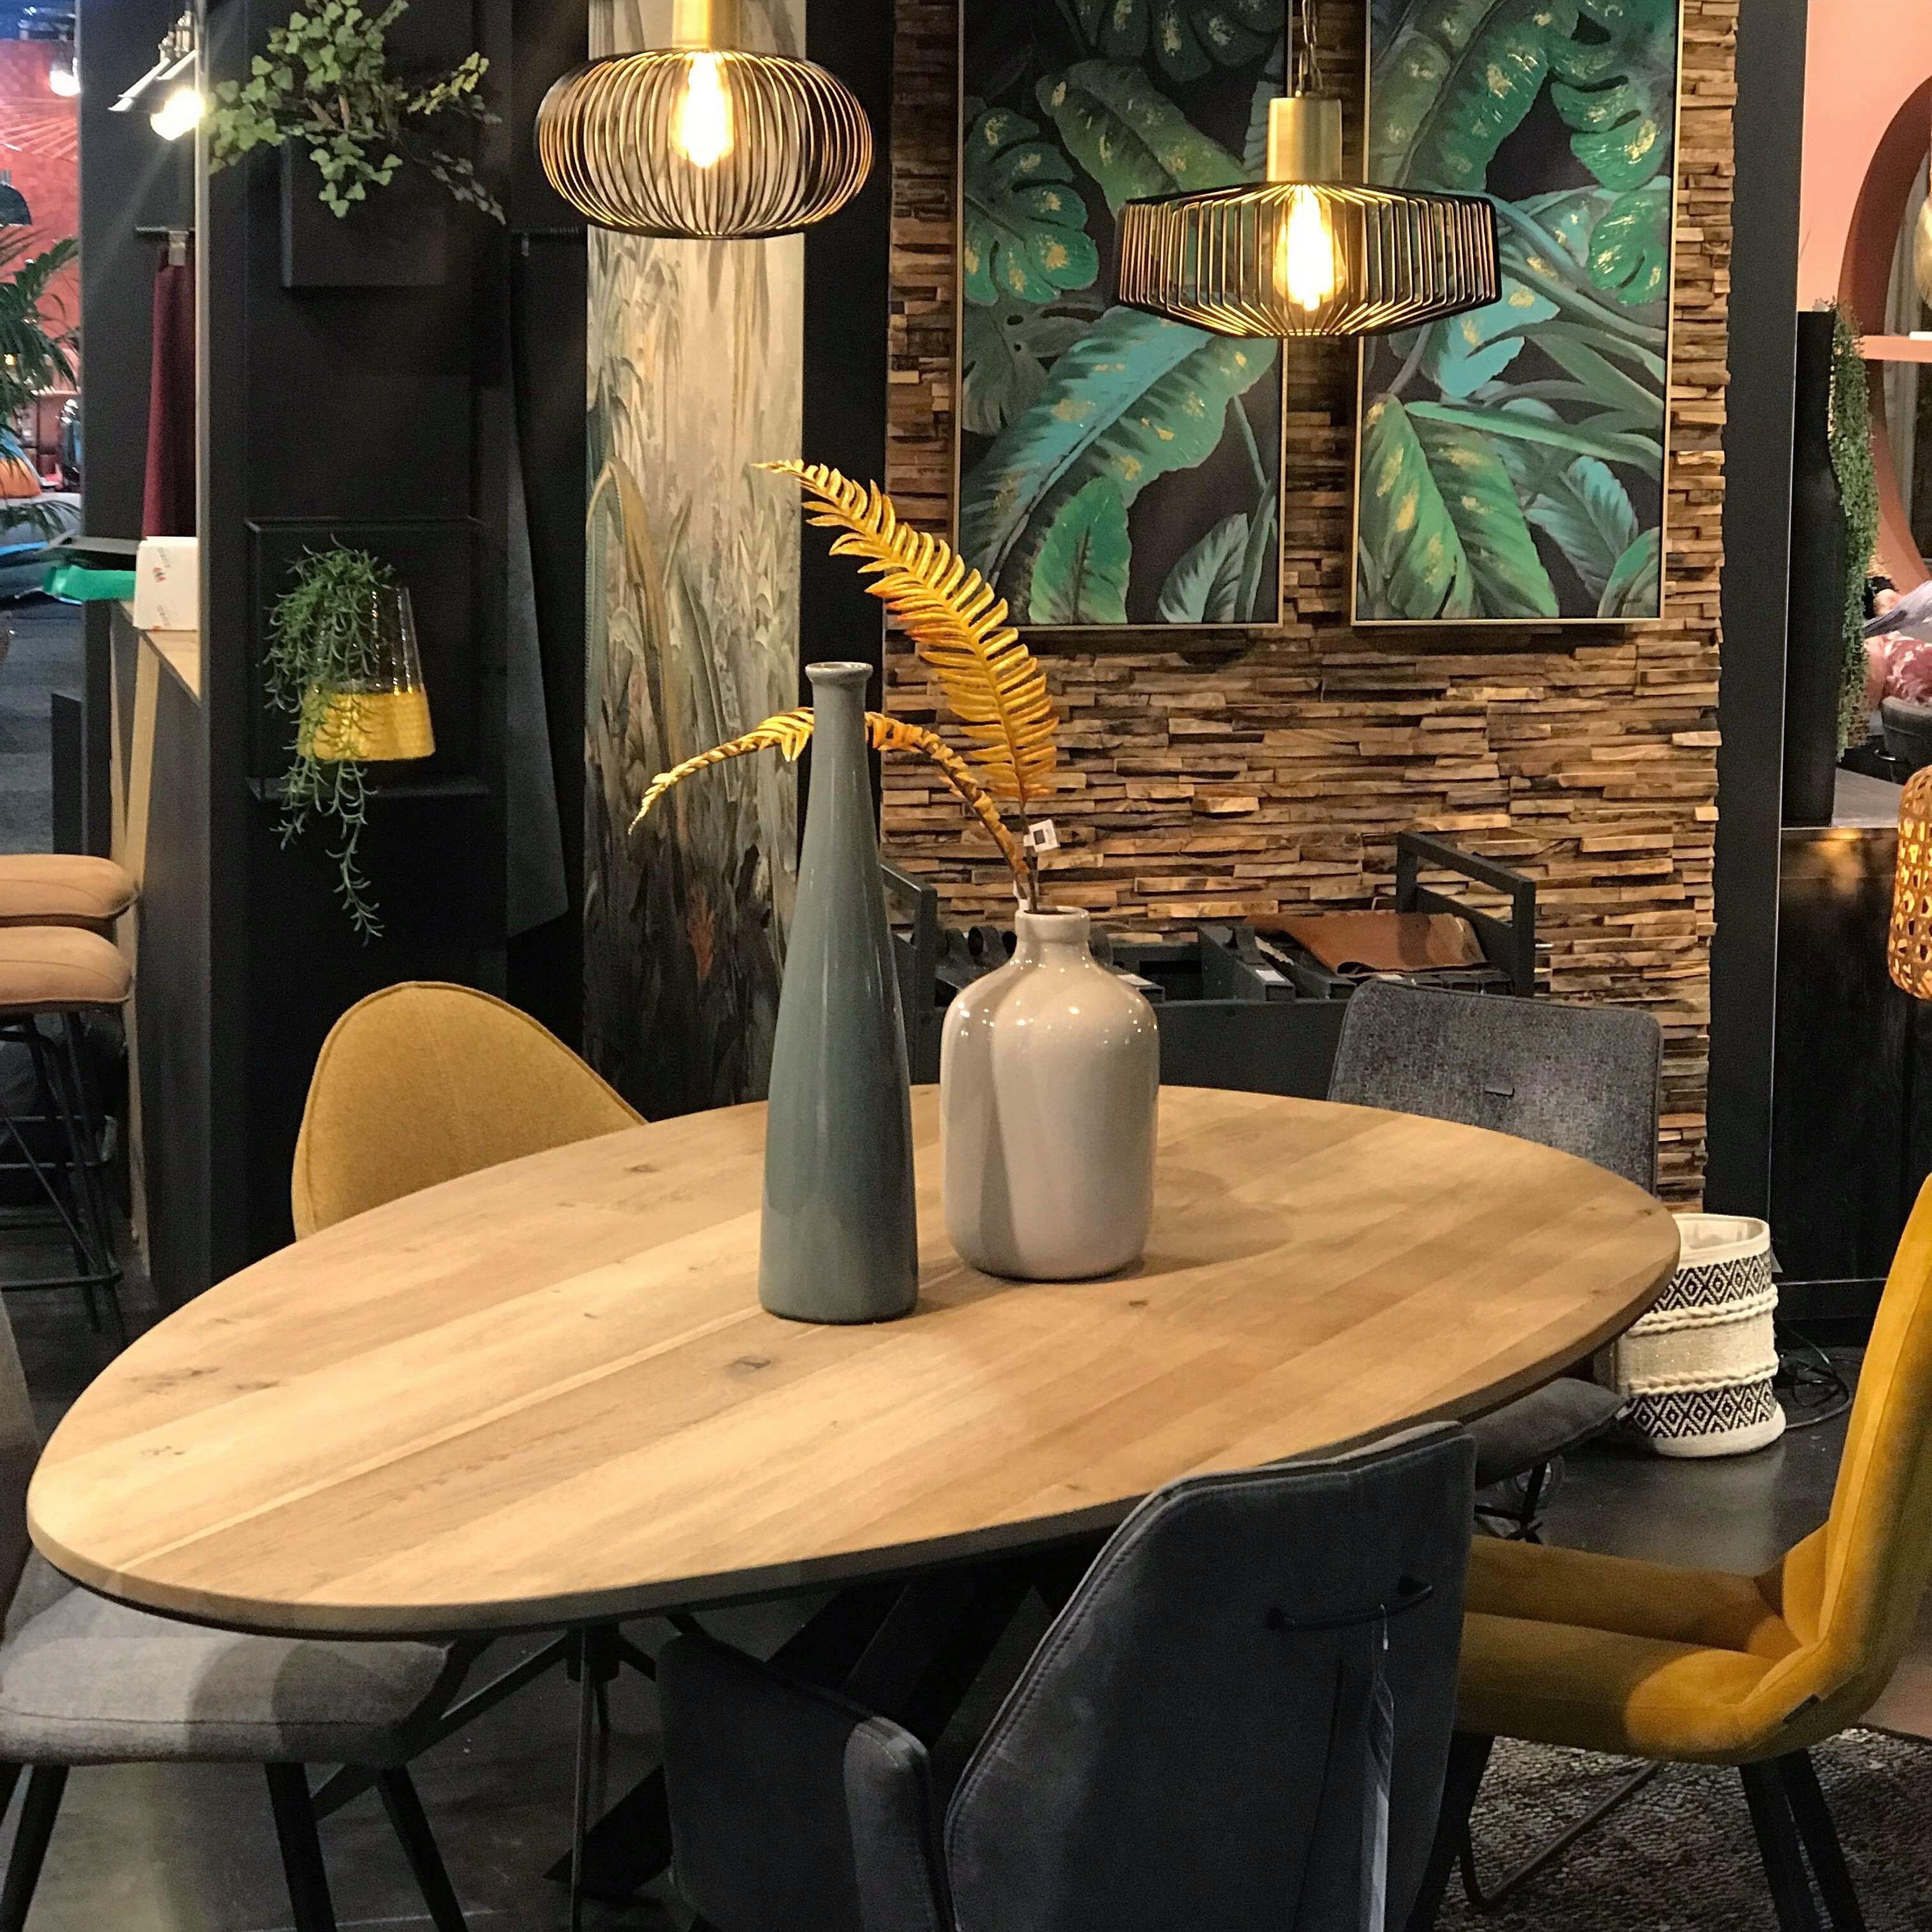 Au Salon Amenago Danjouboda Rechauffe L Ambiance Danjouboda Homeconcept Amenago Amenagolille Salona En 2020 Decoration Interieure Cuisines Deco Meuble Salon